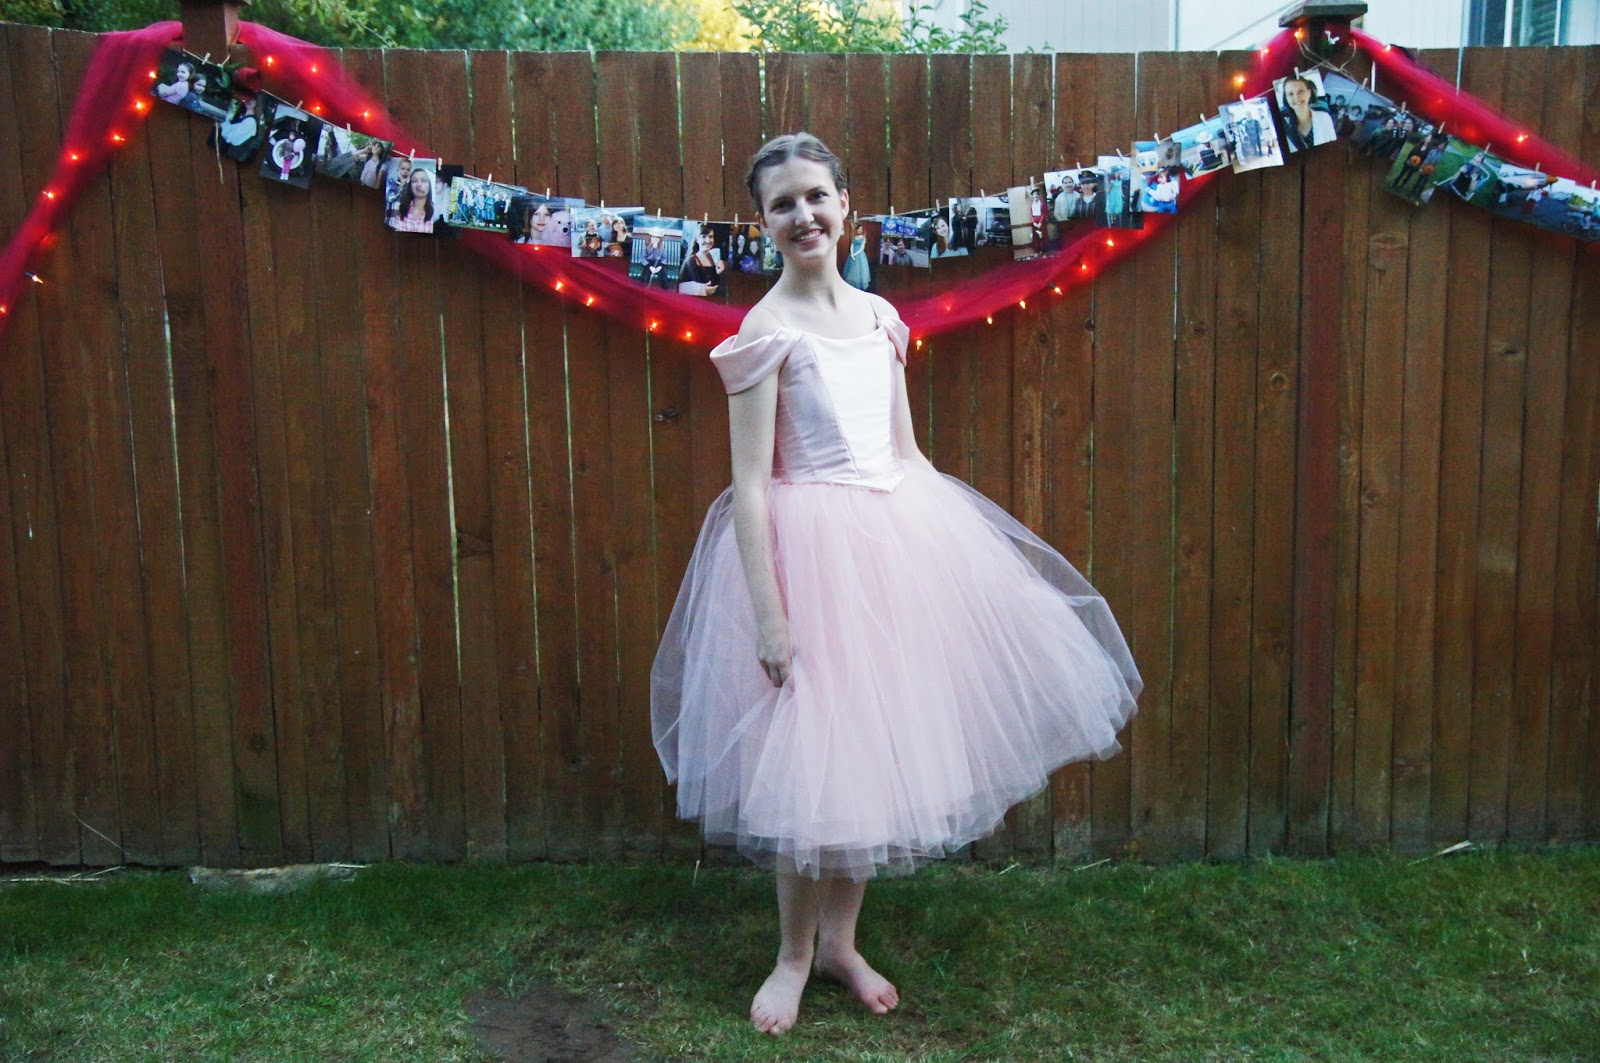 d5d473bdb62 The Making of the Jellyfish  AKA The Graduation Dress